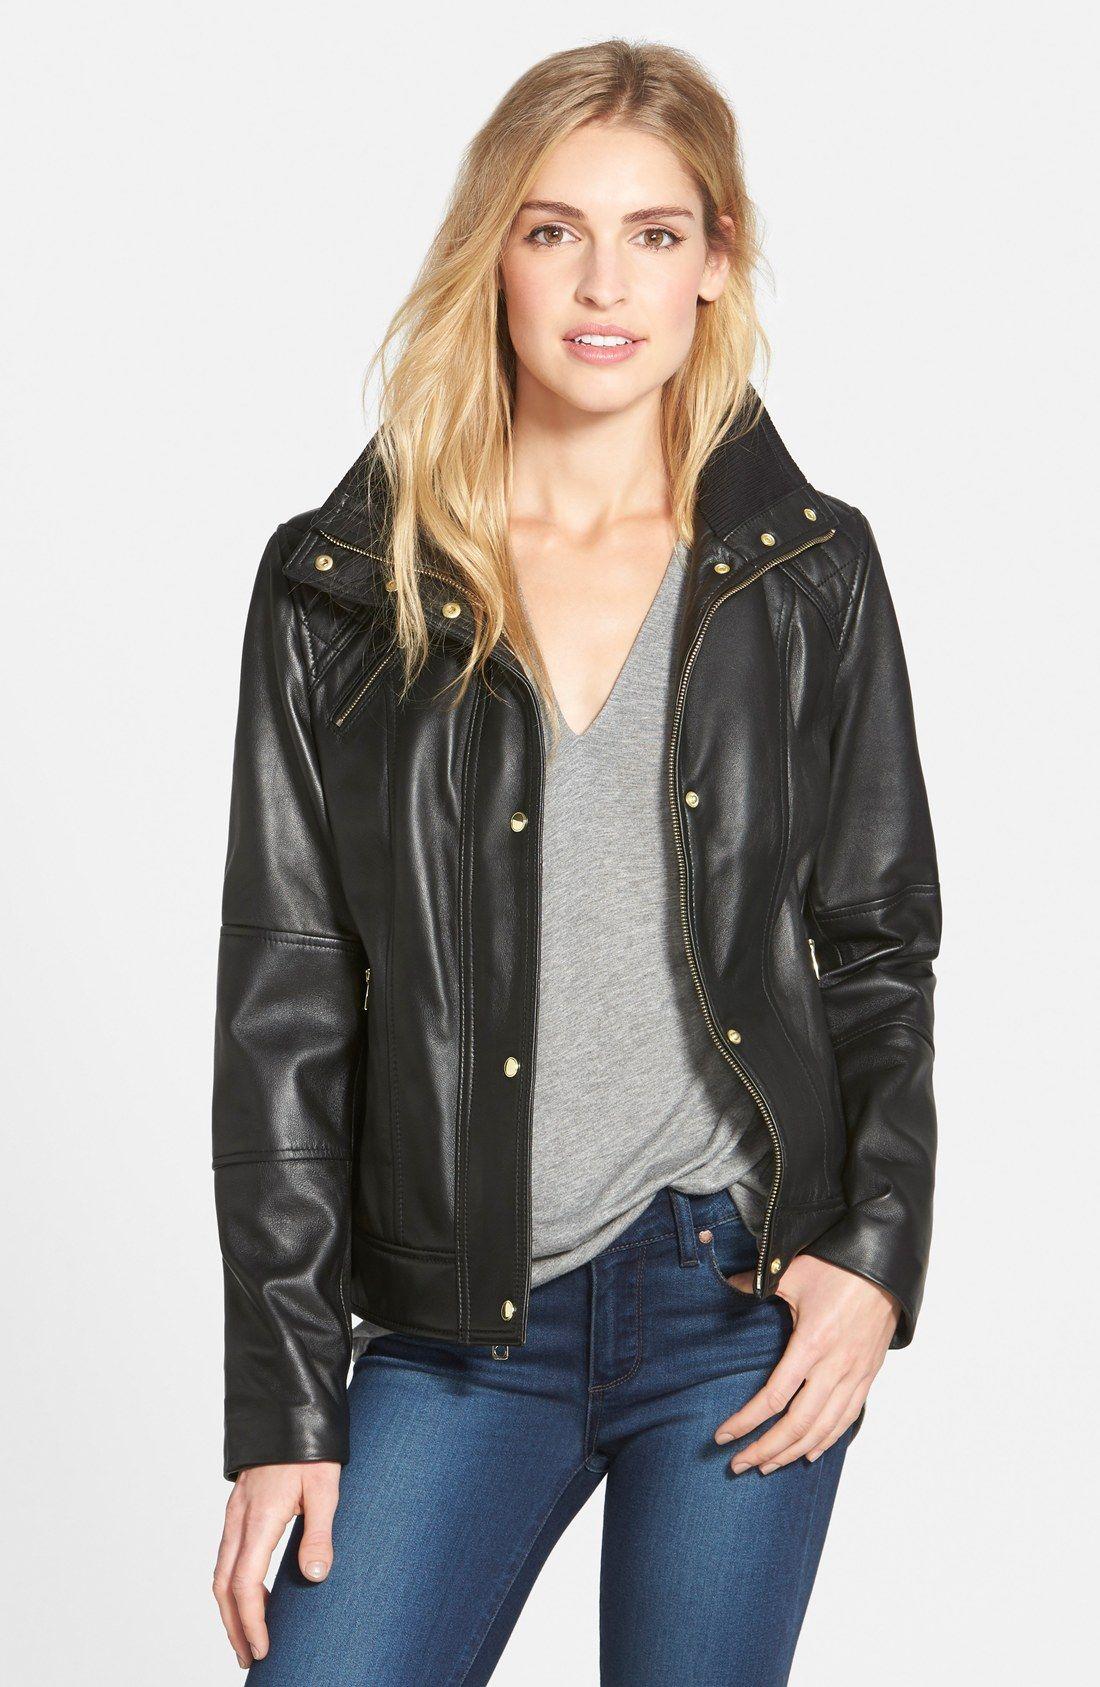 Cole Haan Knit Collar Lambskin Leather Bomber Jacket Nordstrom Leather Bomber Jacket Bomber Jacket Women Bomber Jacket Fashion [ 1687 x 1100 Pixel ]